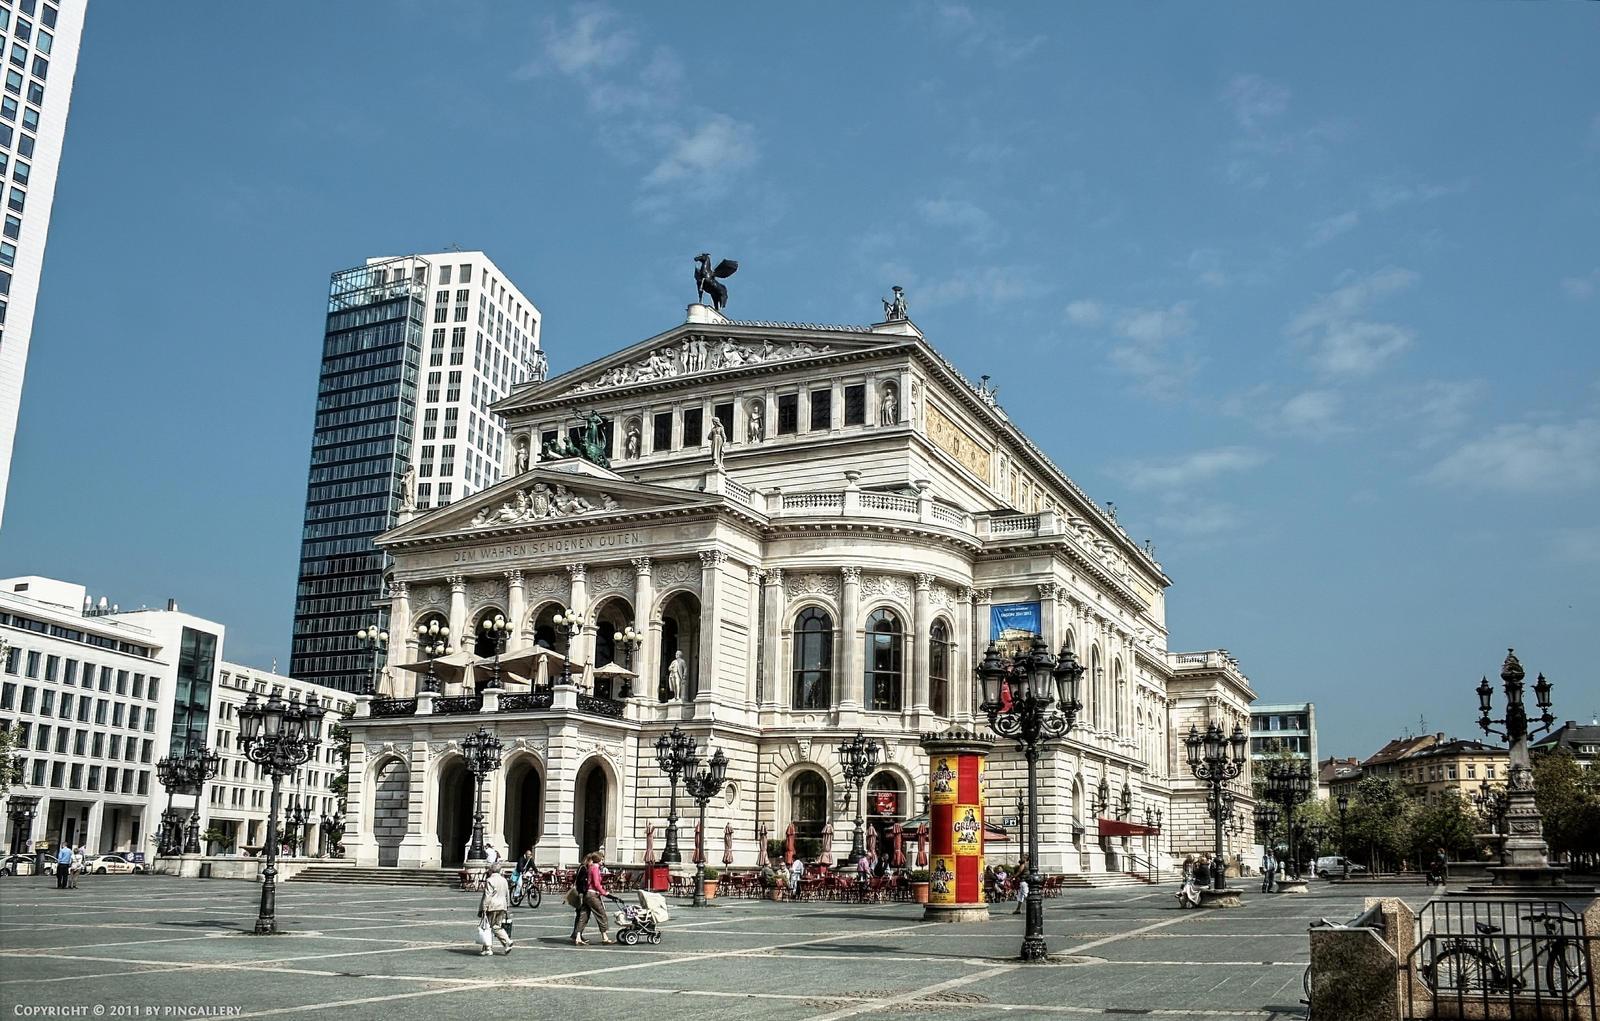 Frankfurt Opera House by pingallery